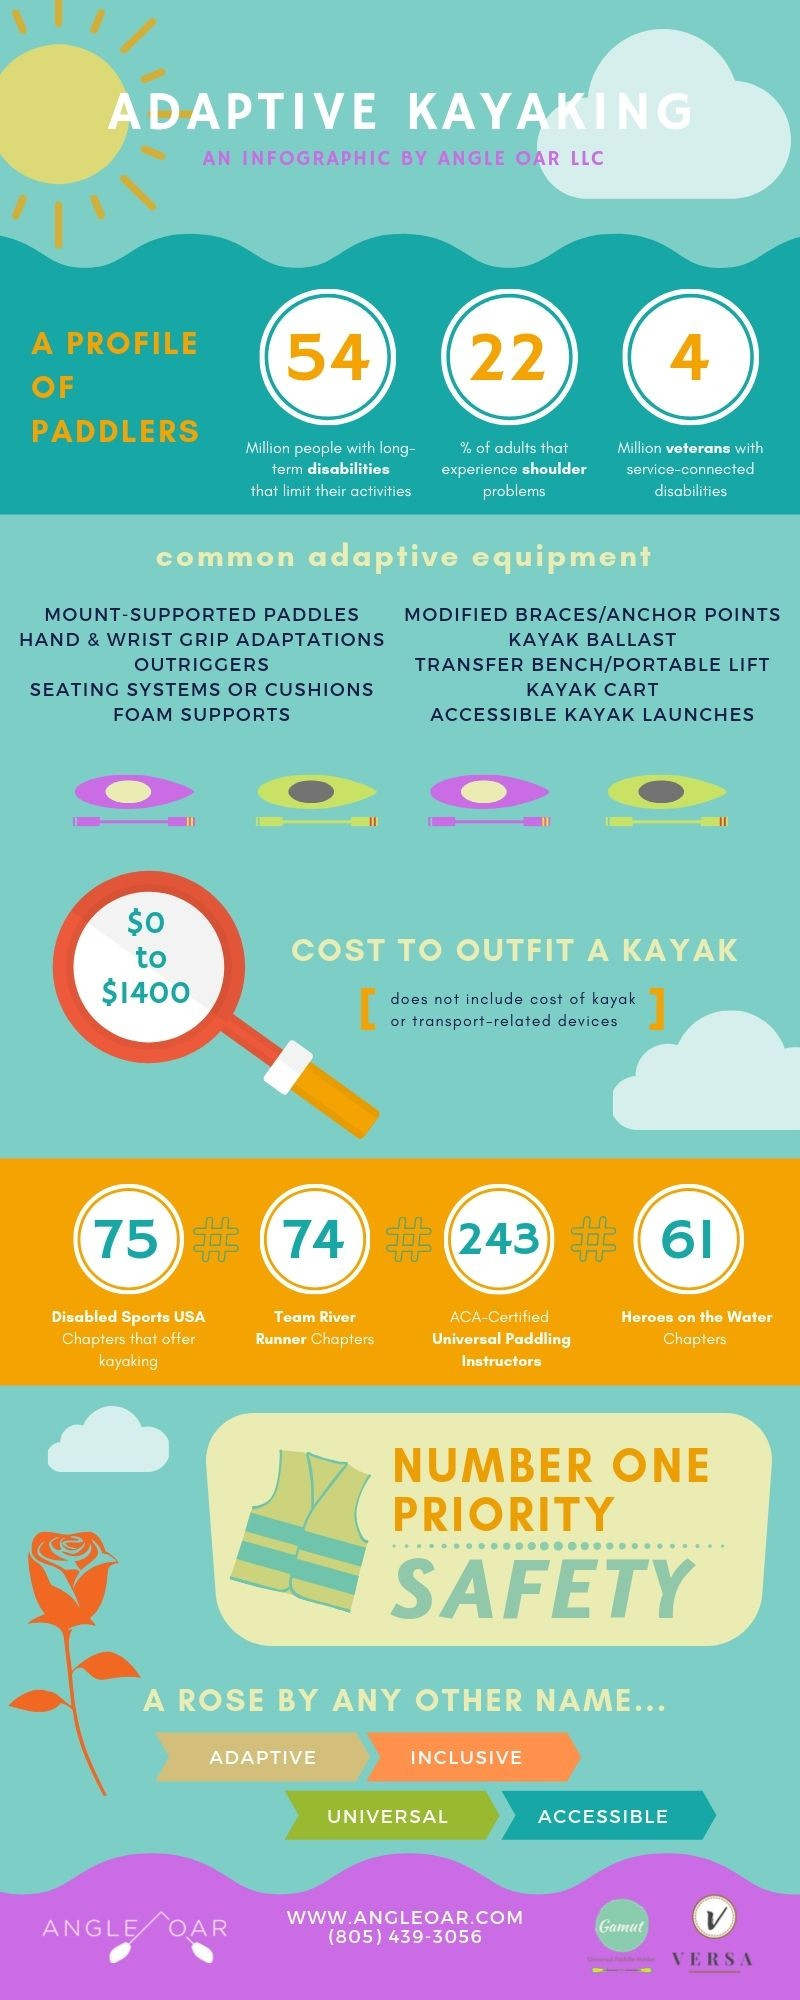 Facts About Adaptive Kayaking and Universal Paddling